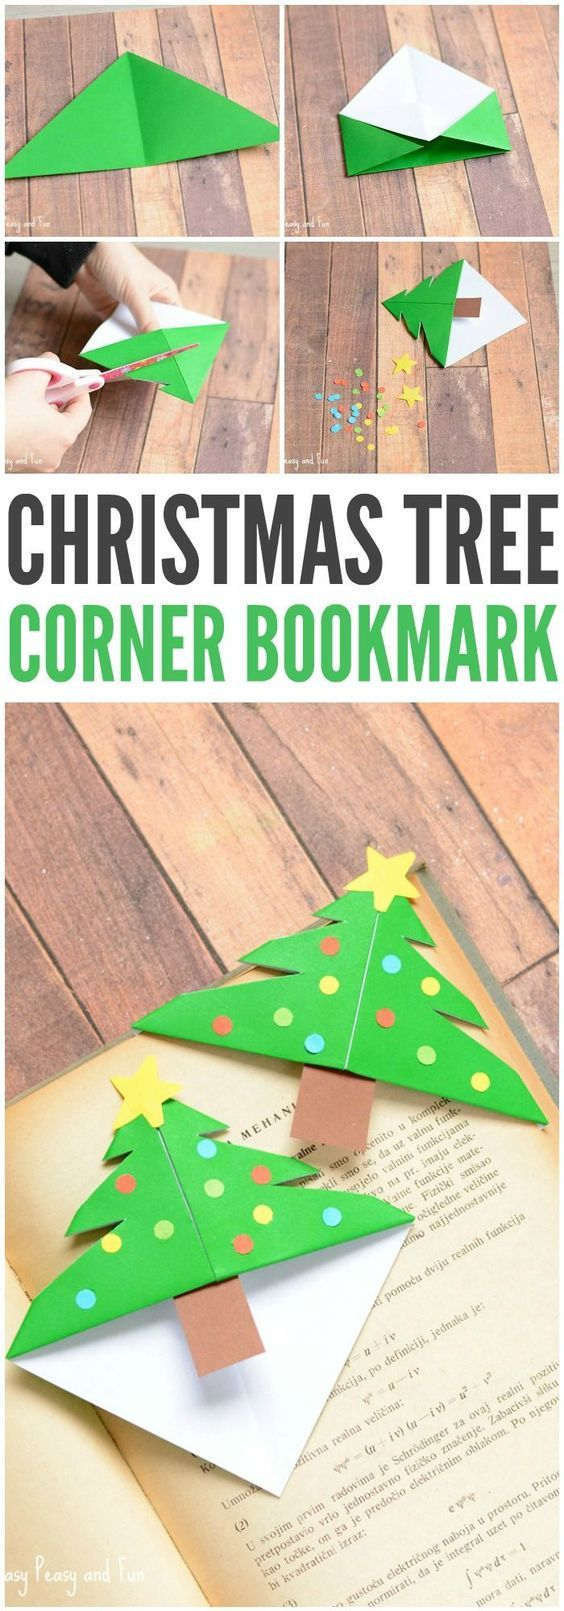 Best 25+ Simple christmas crafts ideas on Pinterest   Christmas ...